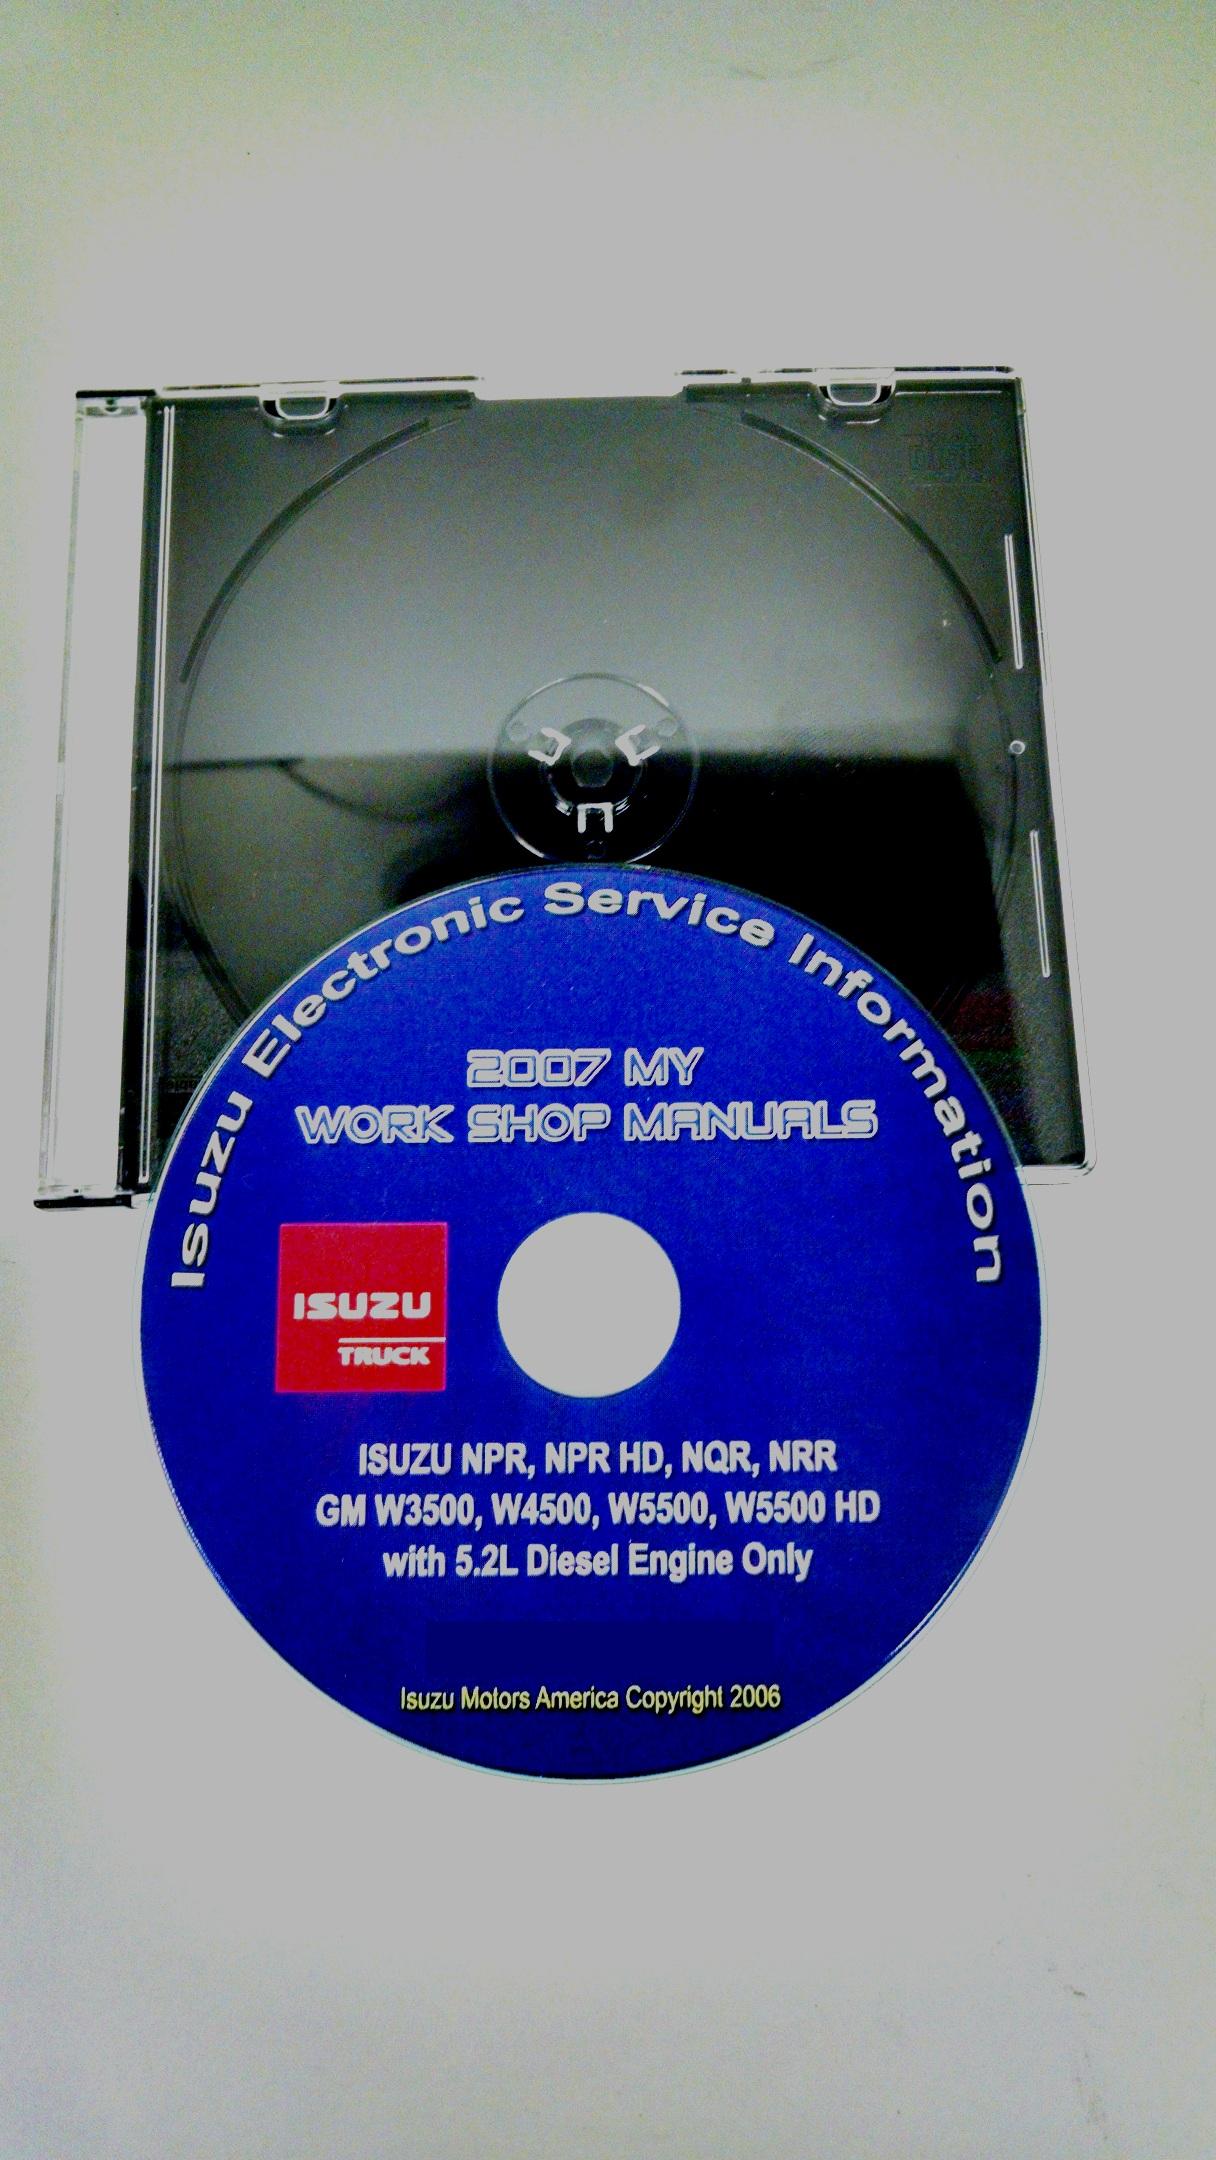 hight resolution of 2007 npr nqr nrr gm w3500 w4500 w5500 service manual cd rom 2006 isuzu npr hd 2007 w4500 isuzu npr hd engine diagram